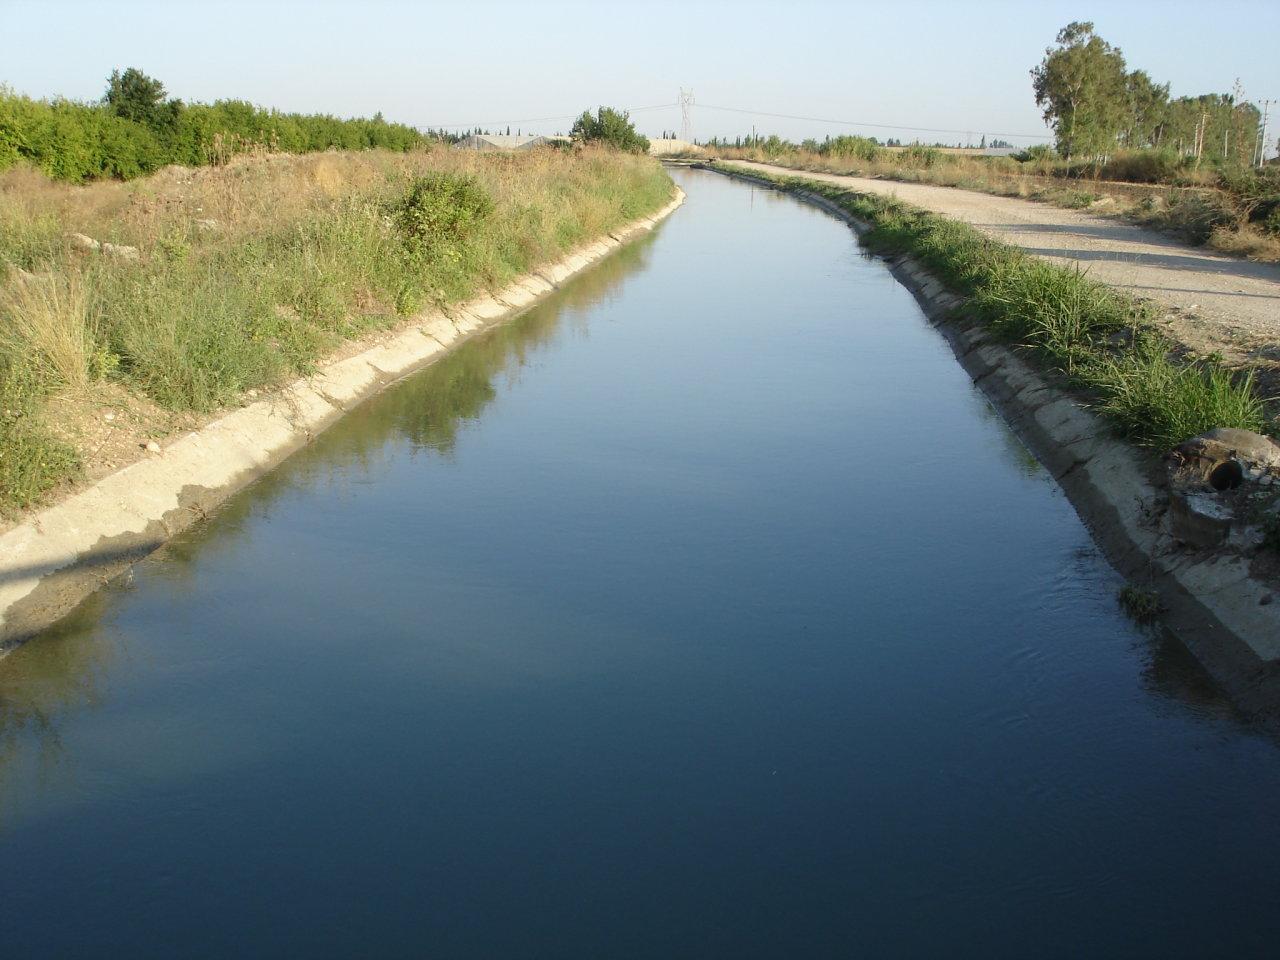 2020/06/water_kanal_020512_1592986572.jpg